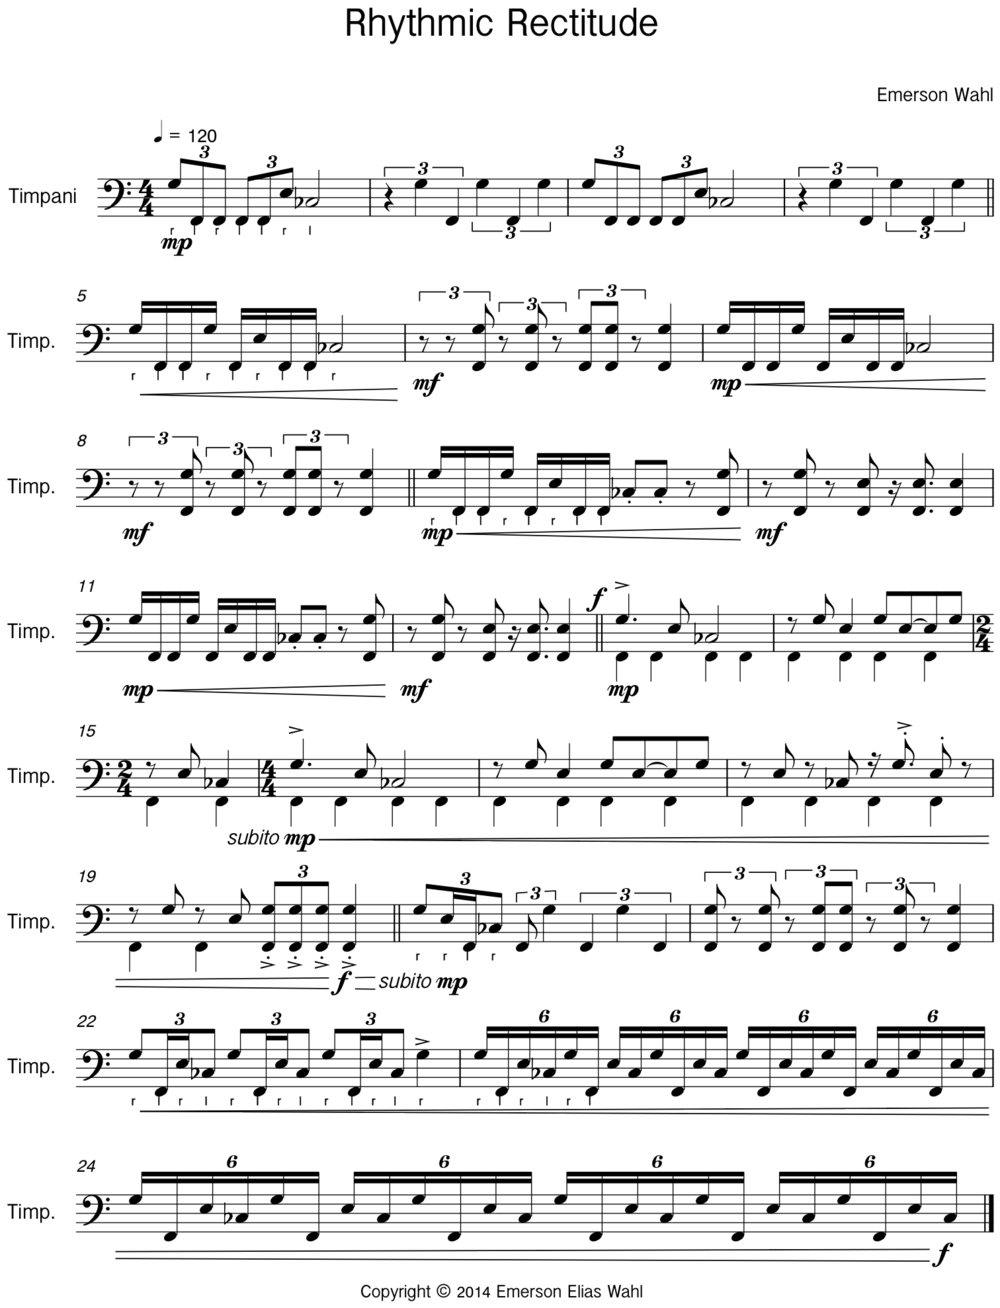 Rhythmic Rectitude.png